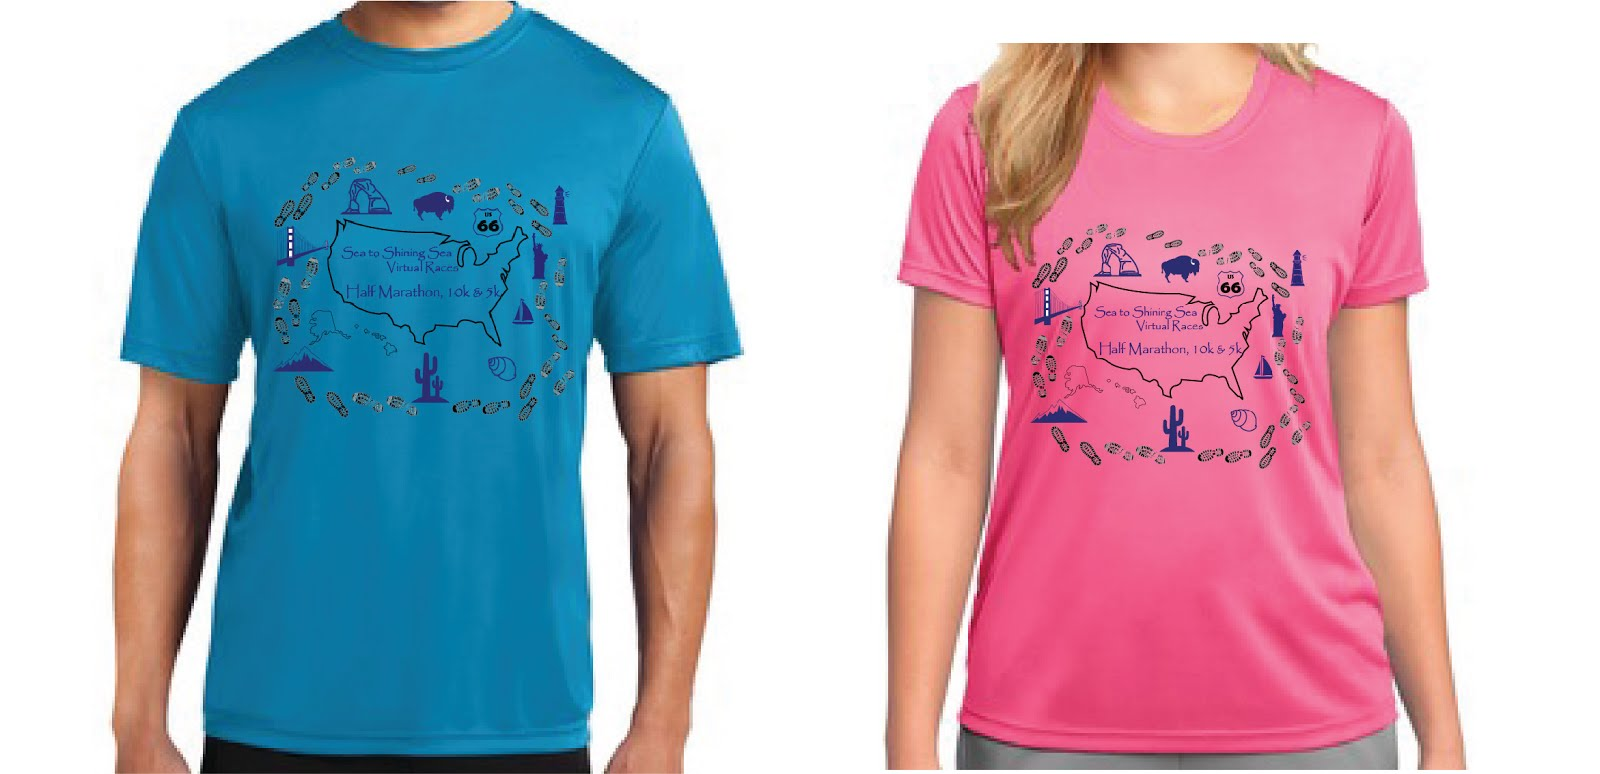 Our T-shirt Design